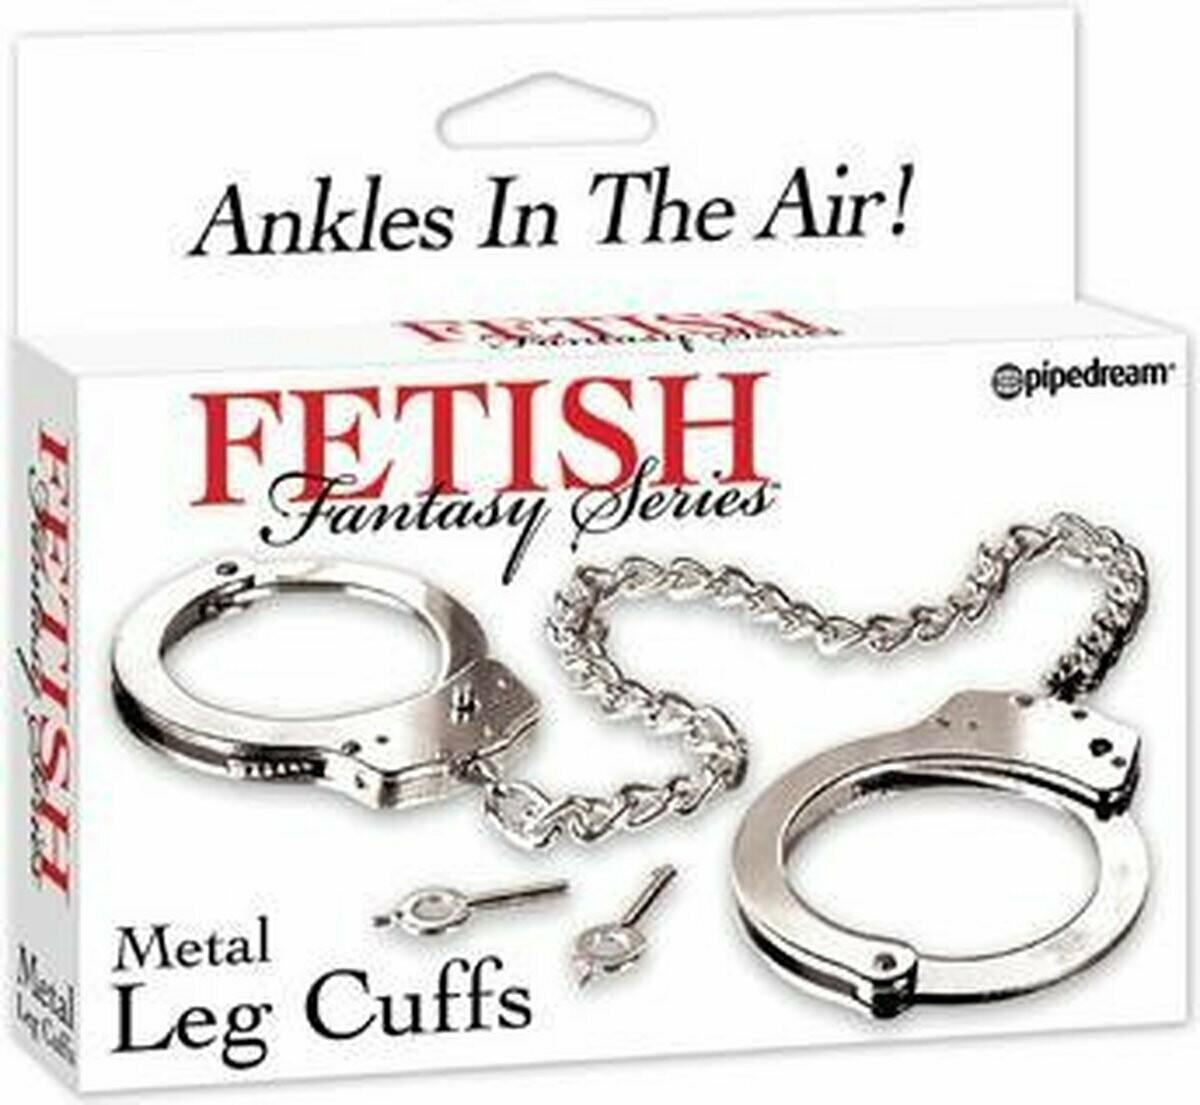 FF METAL LEG CUFFS